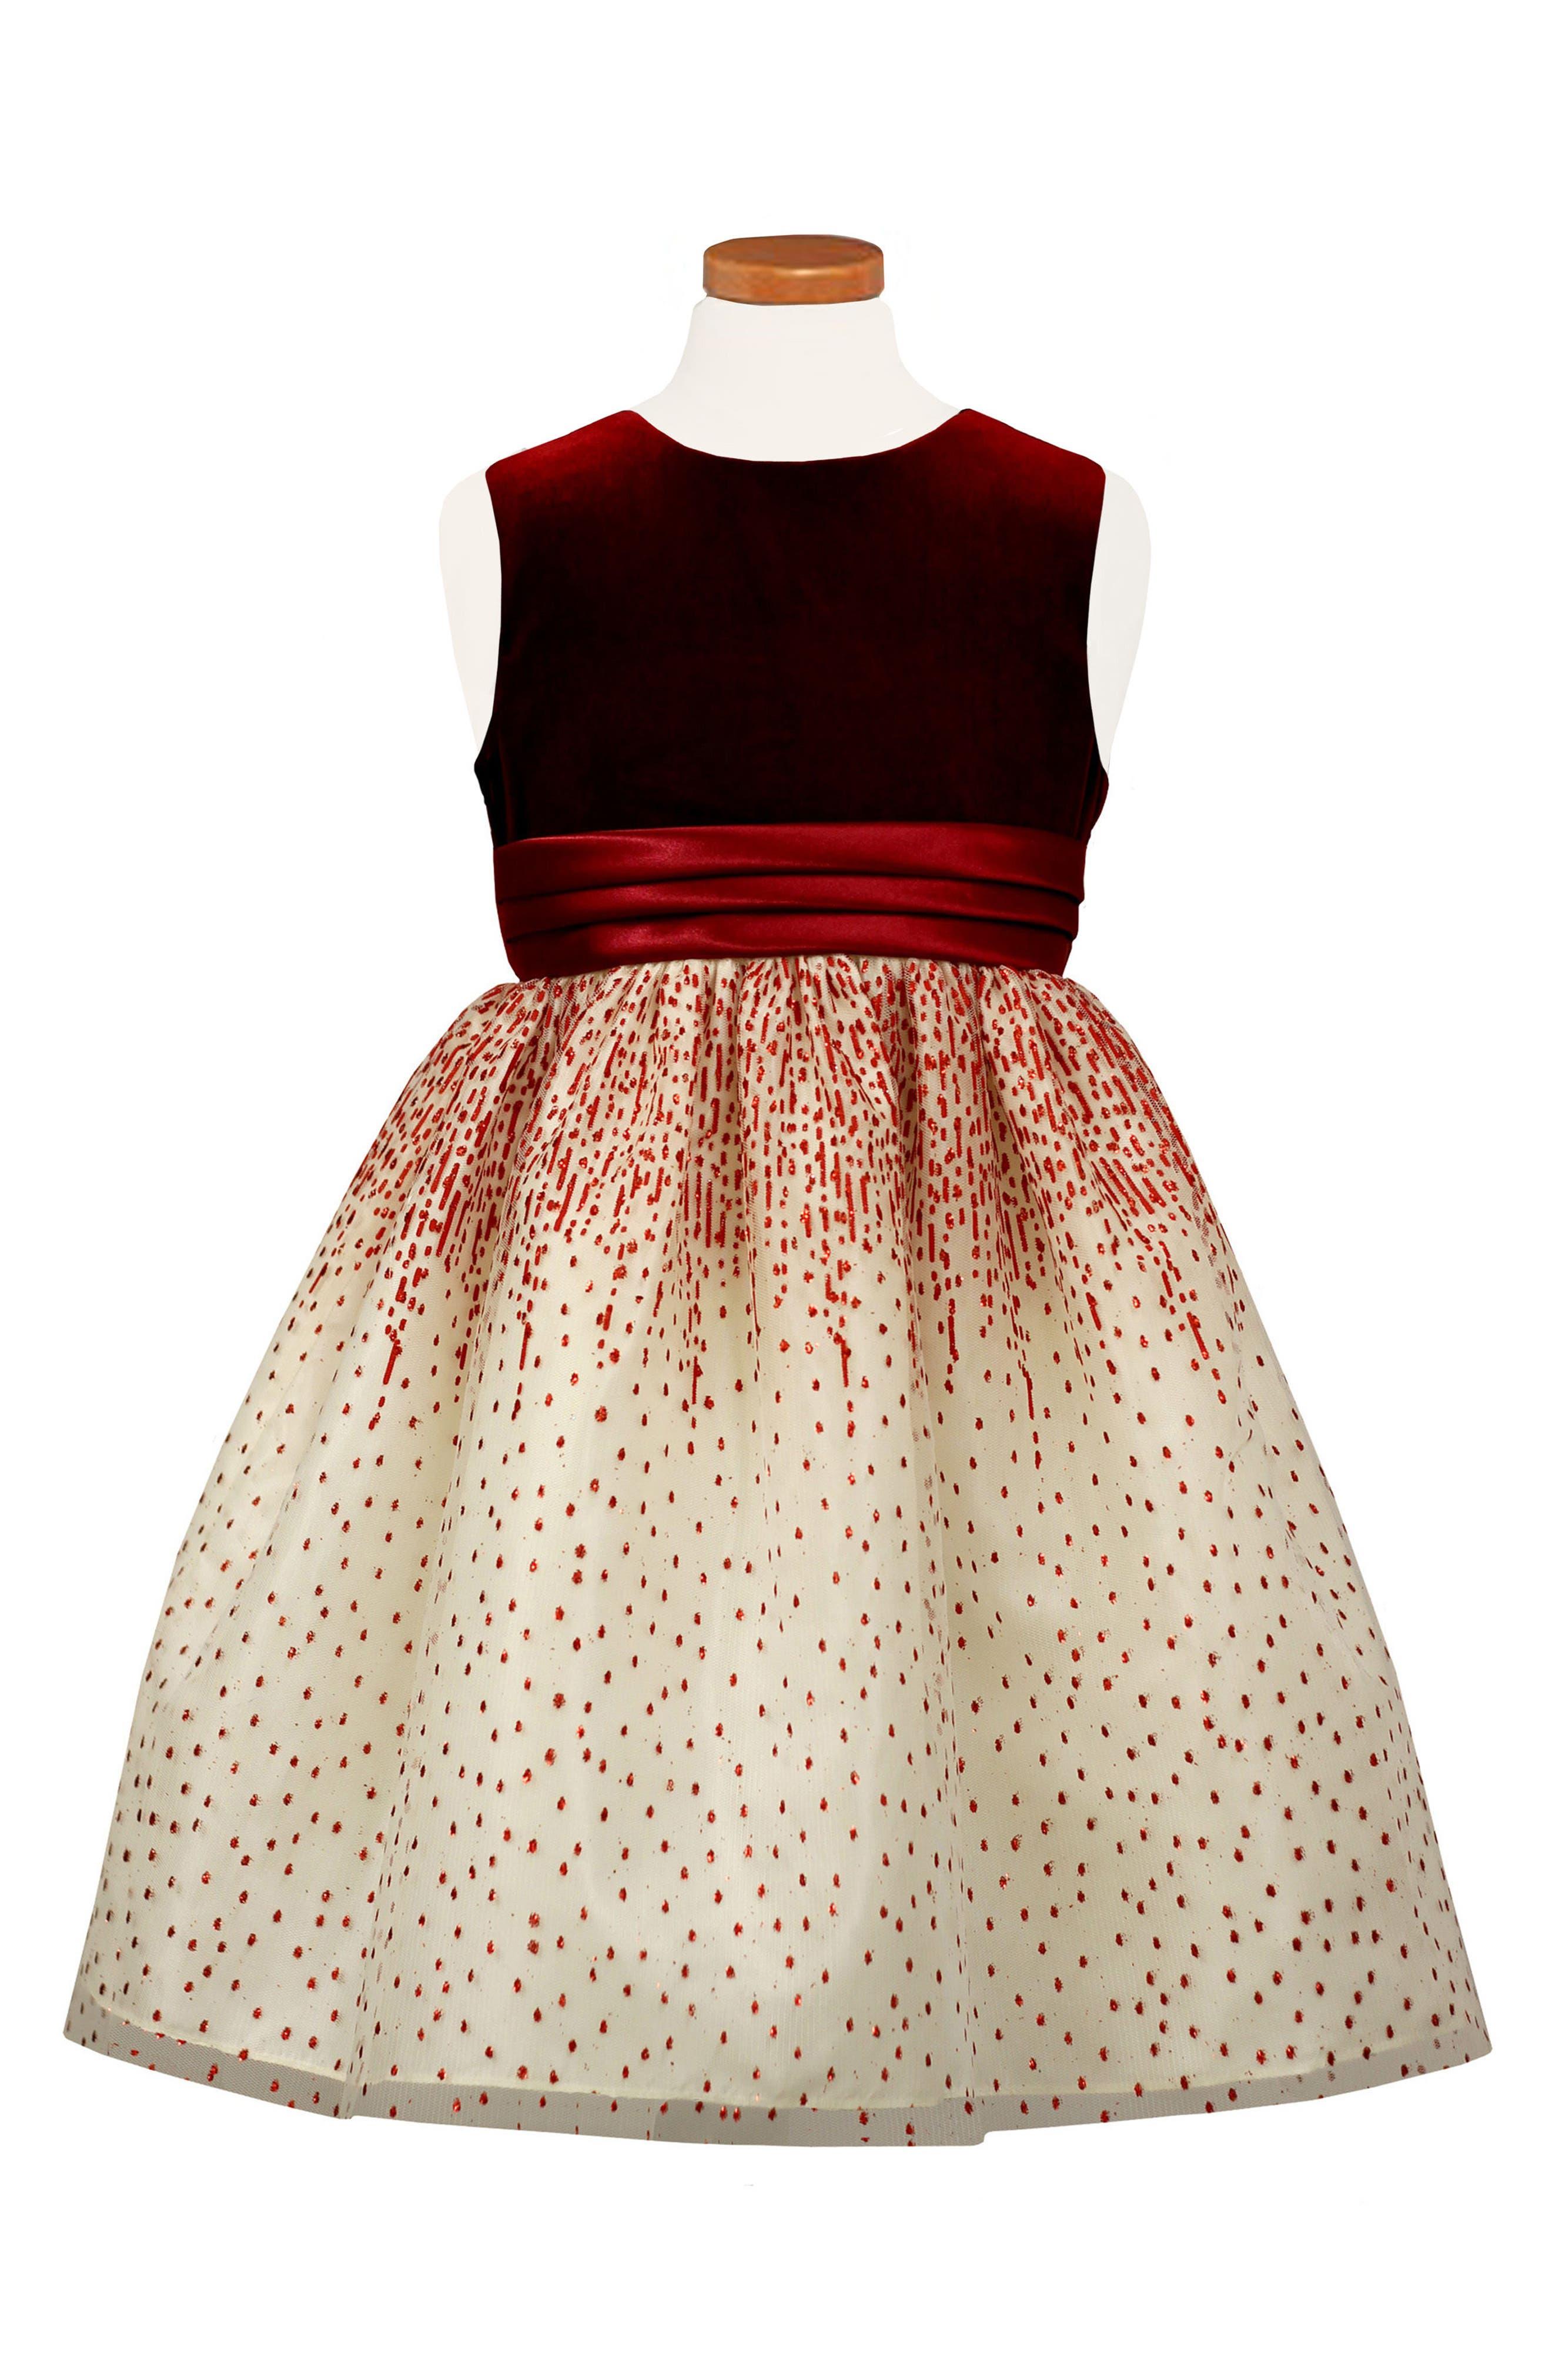 Velvet Bodice Party Dress,                             Main thumbnail 1, color,                             Red